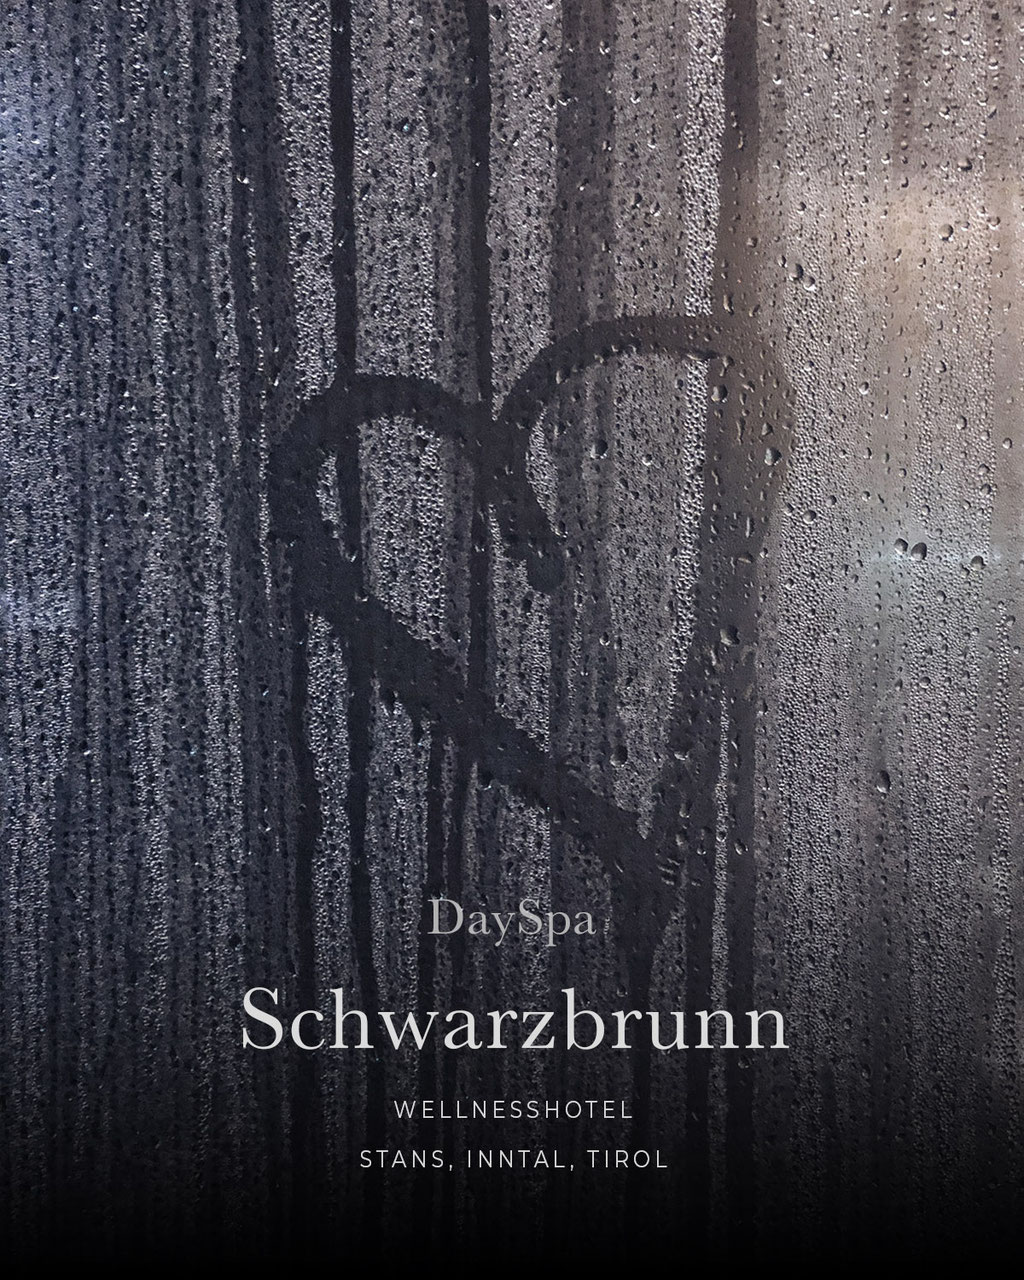 DAY SPA, Schwarzbrunn - Tirol